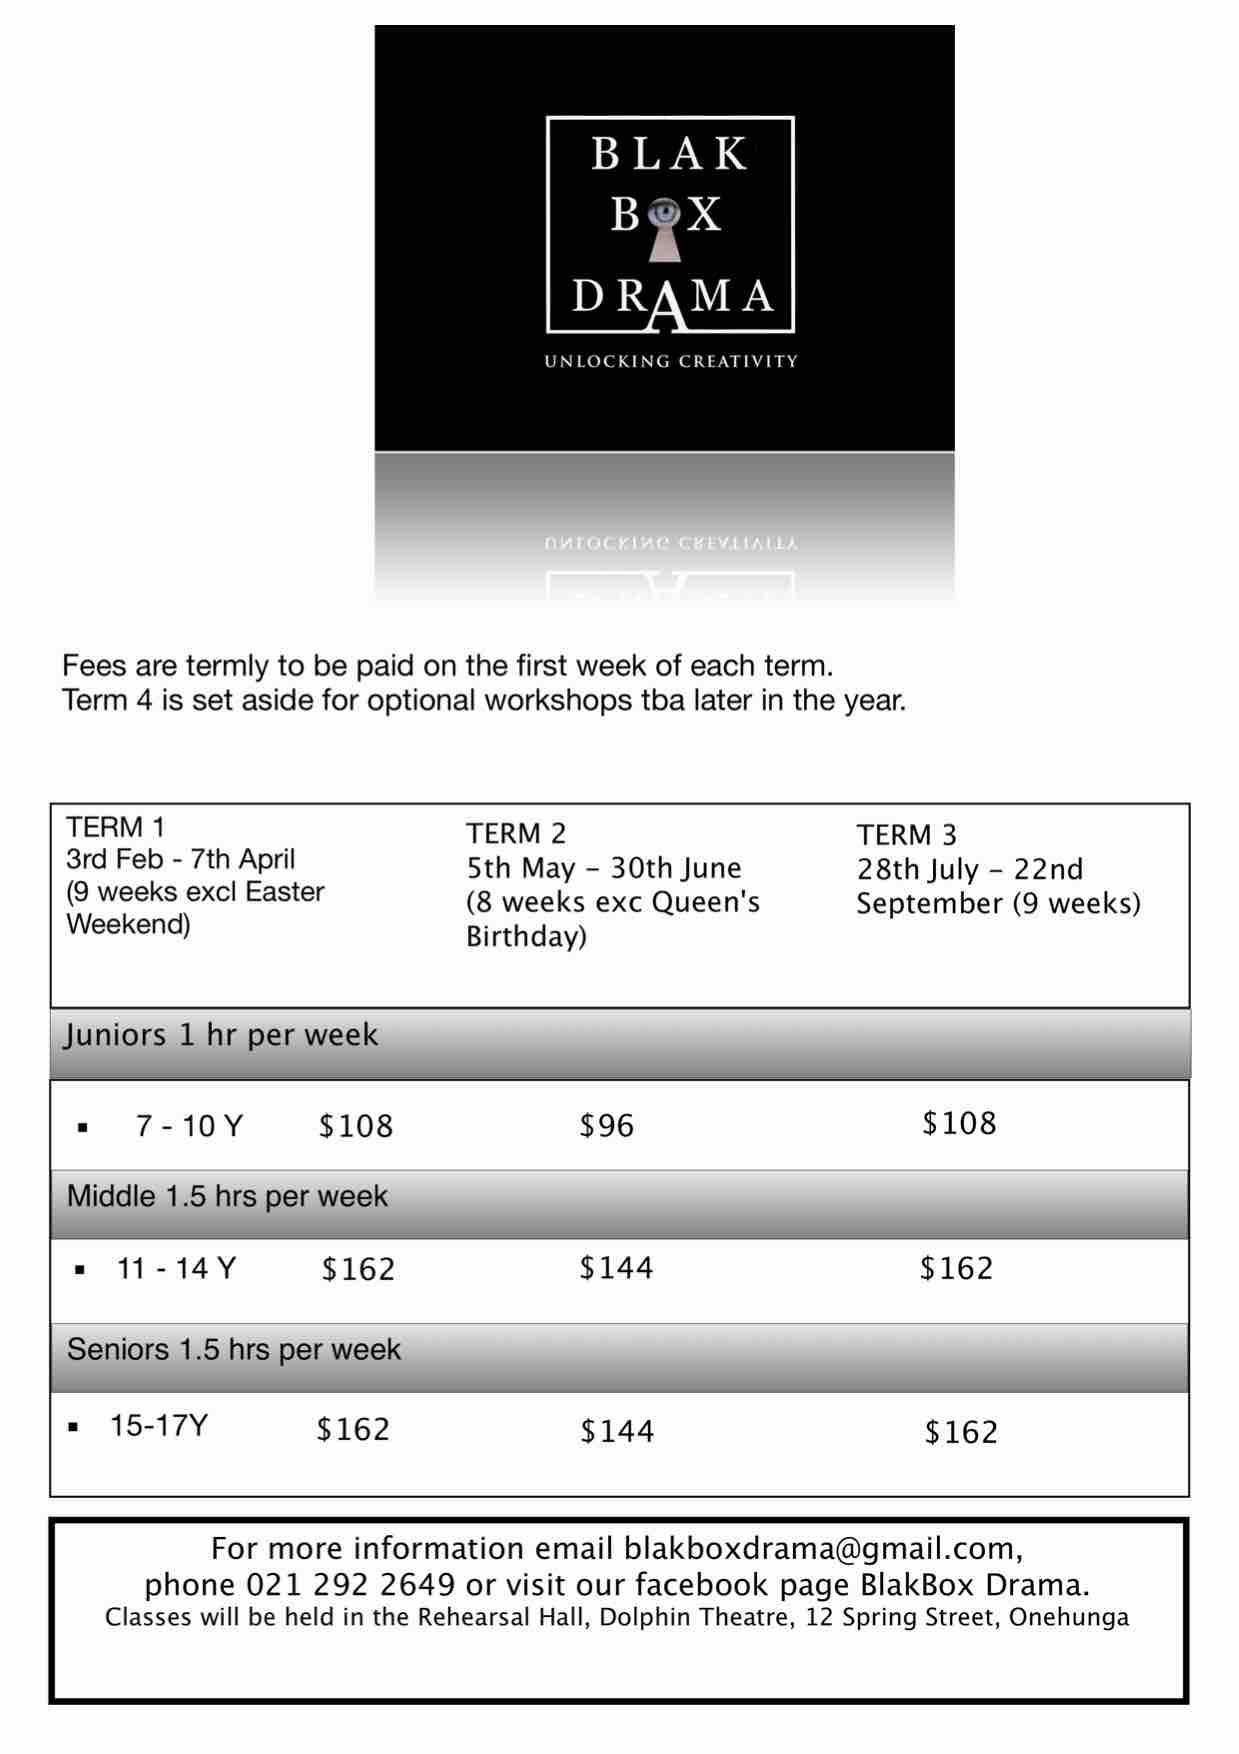 blakbox dates and prices 2018v2.jpg